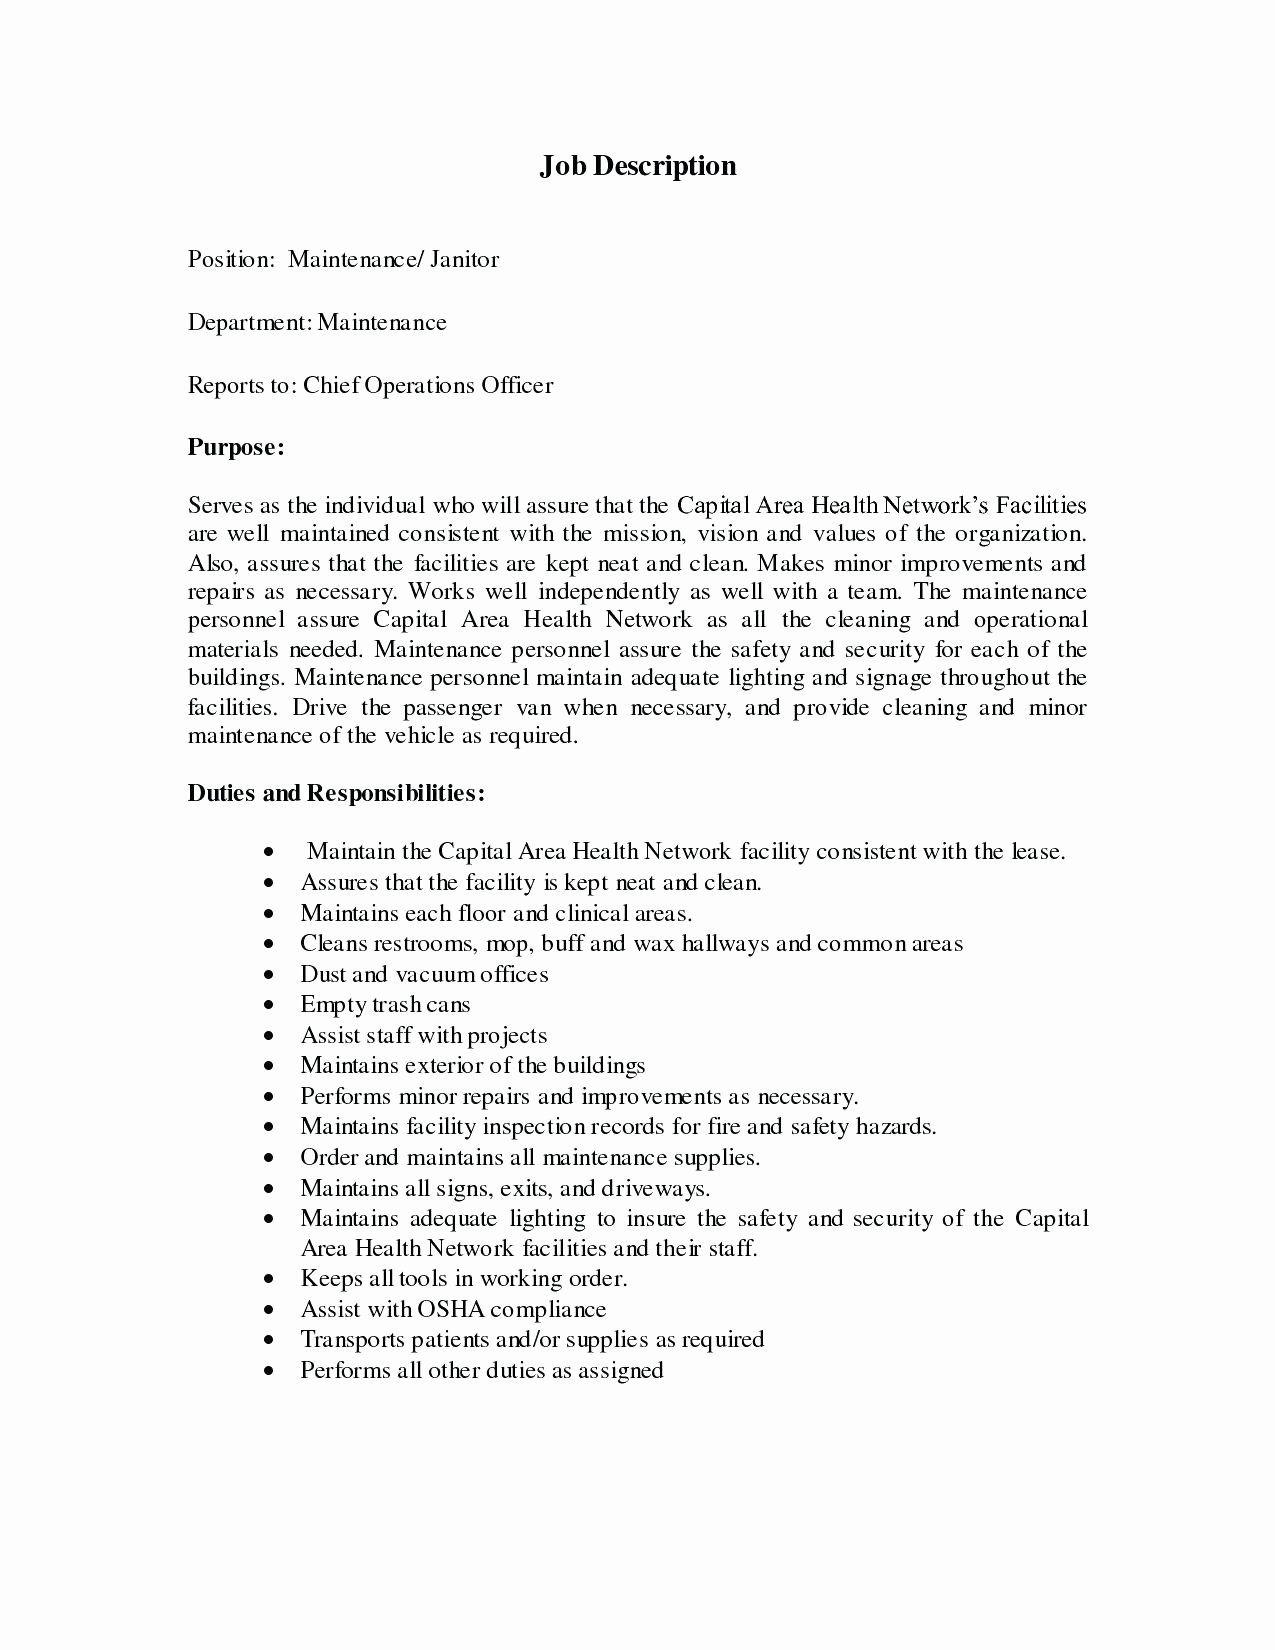 23 janitor job description resume job description